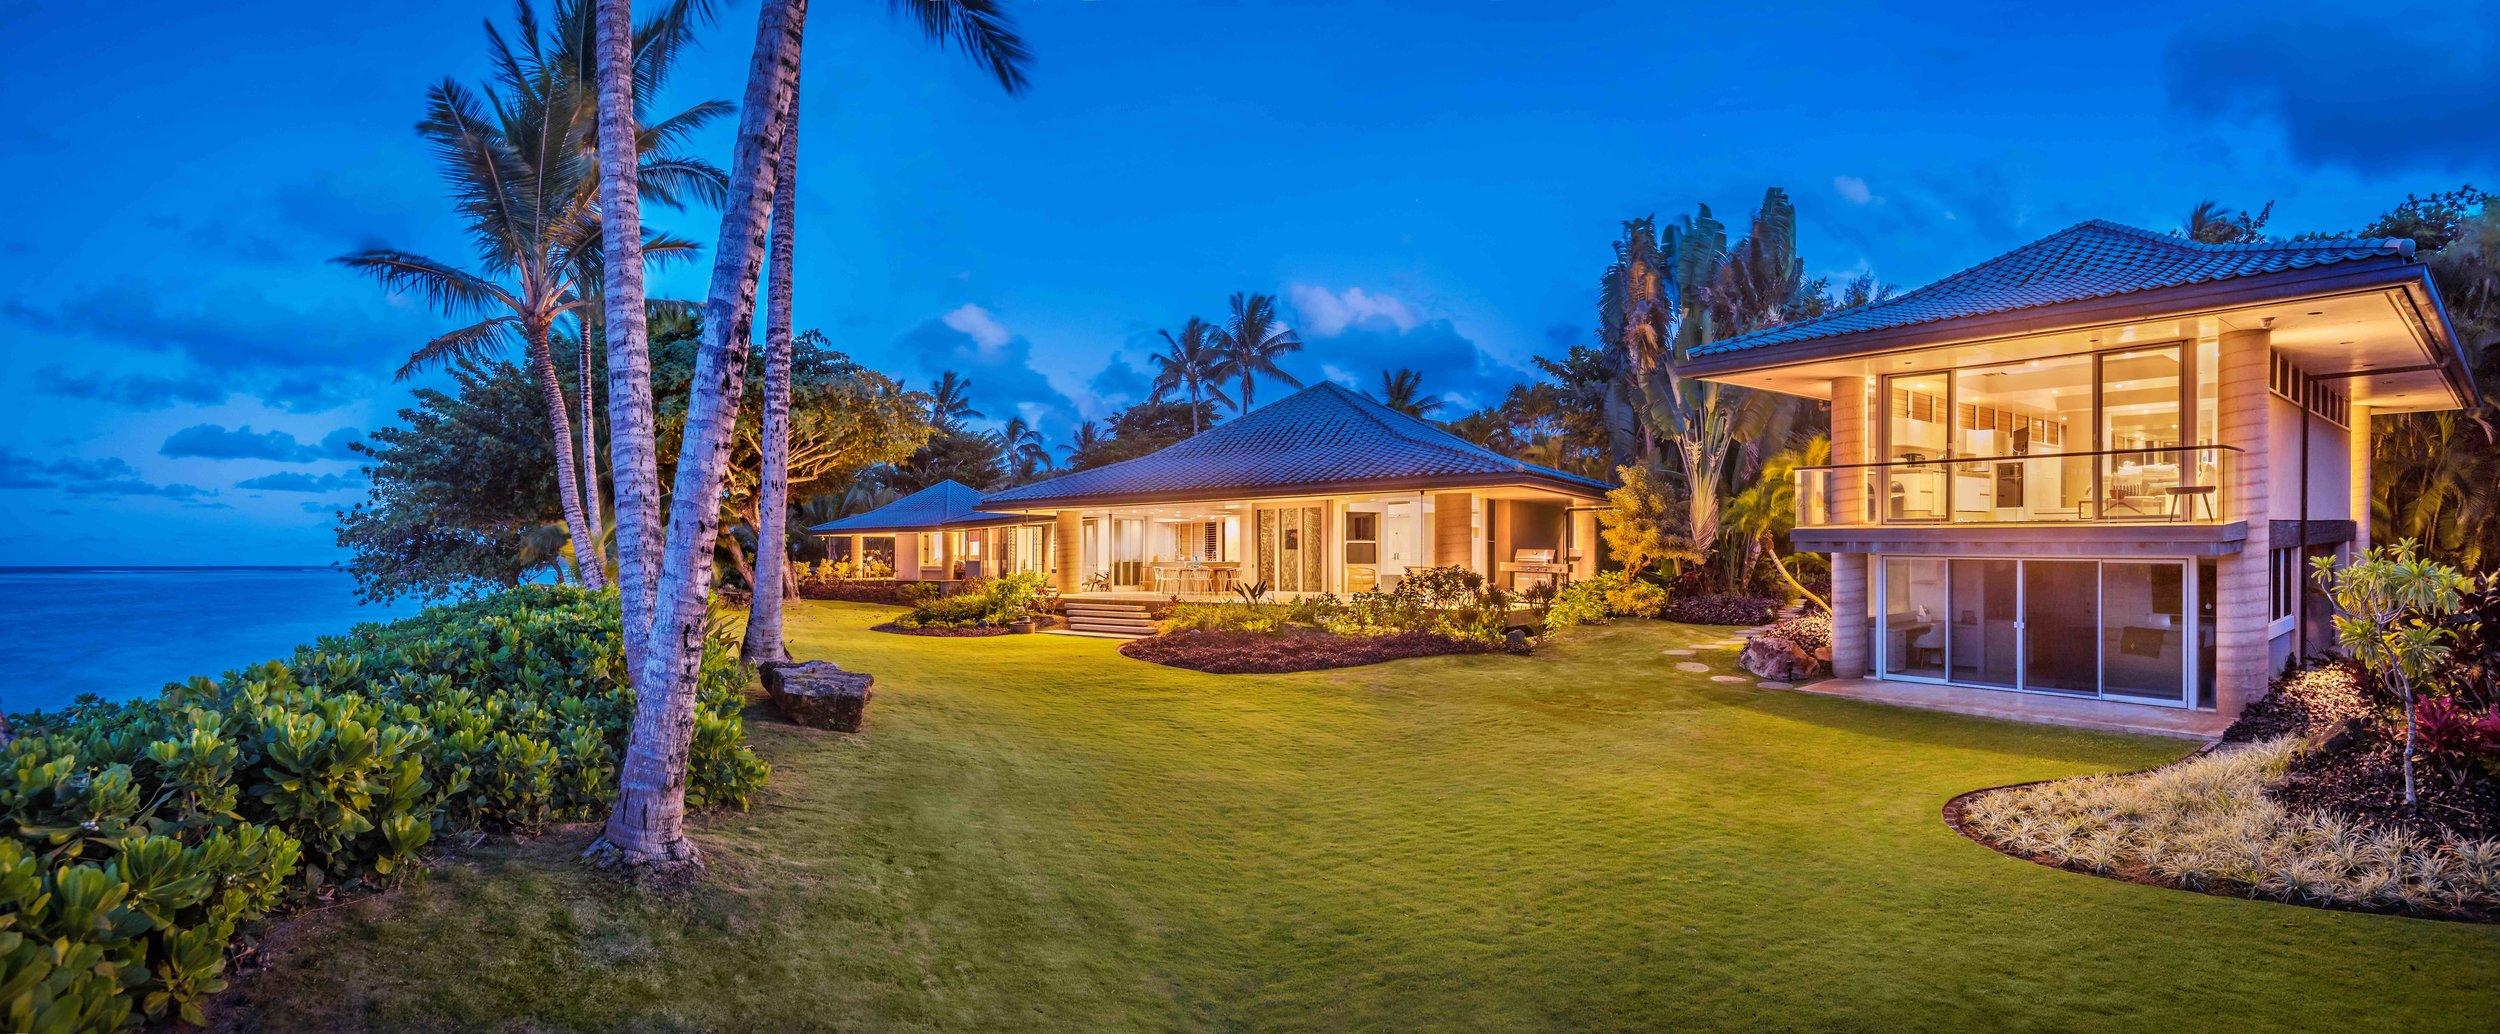 Anini Beach House - EliteLYFE